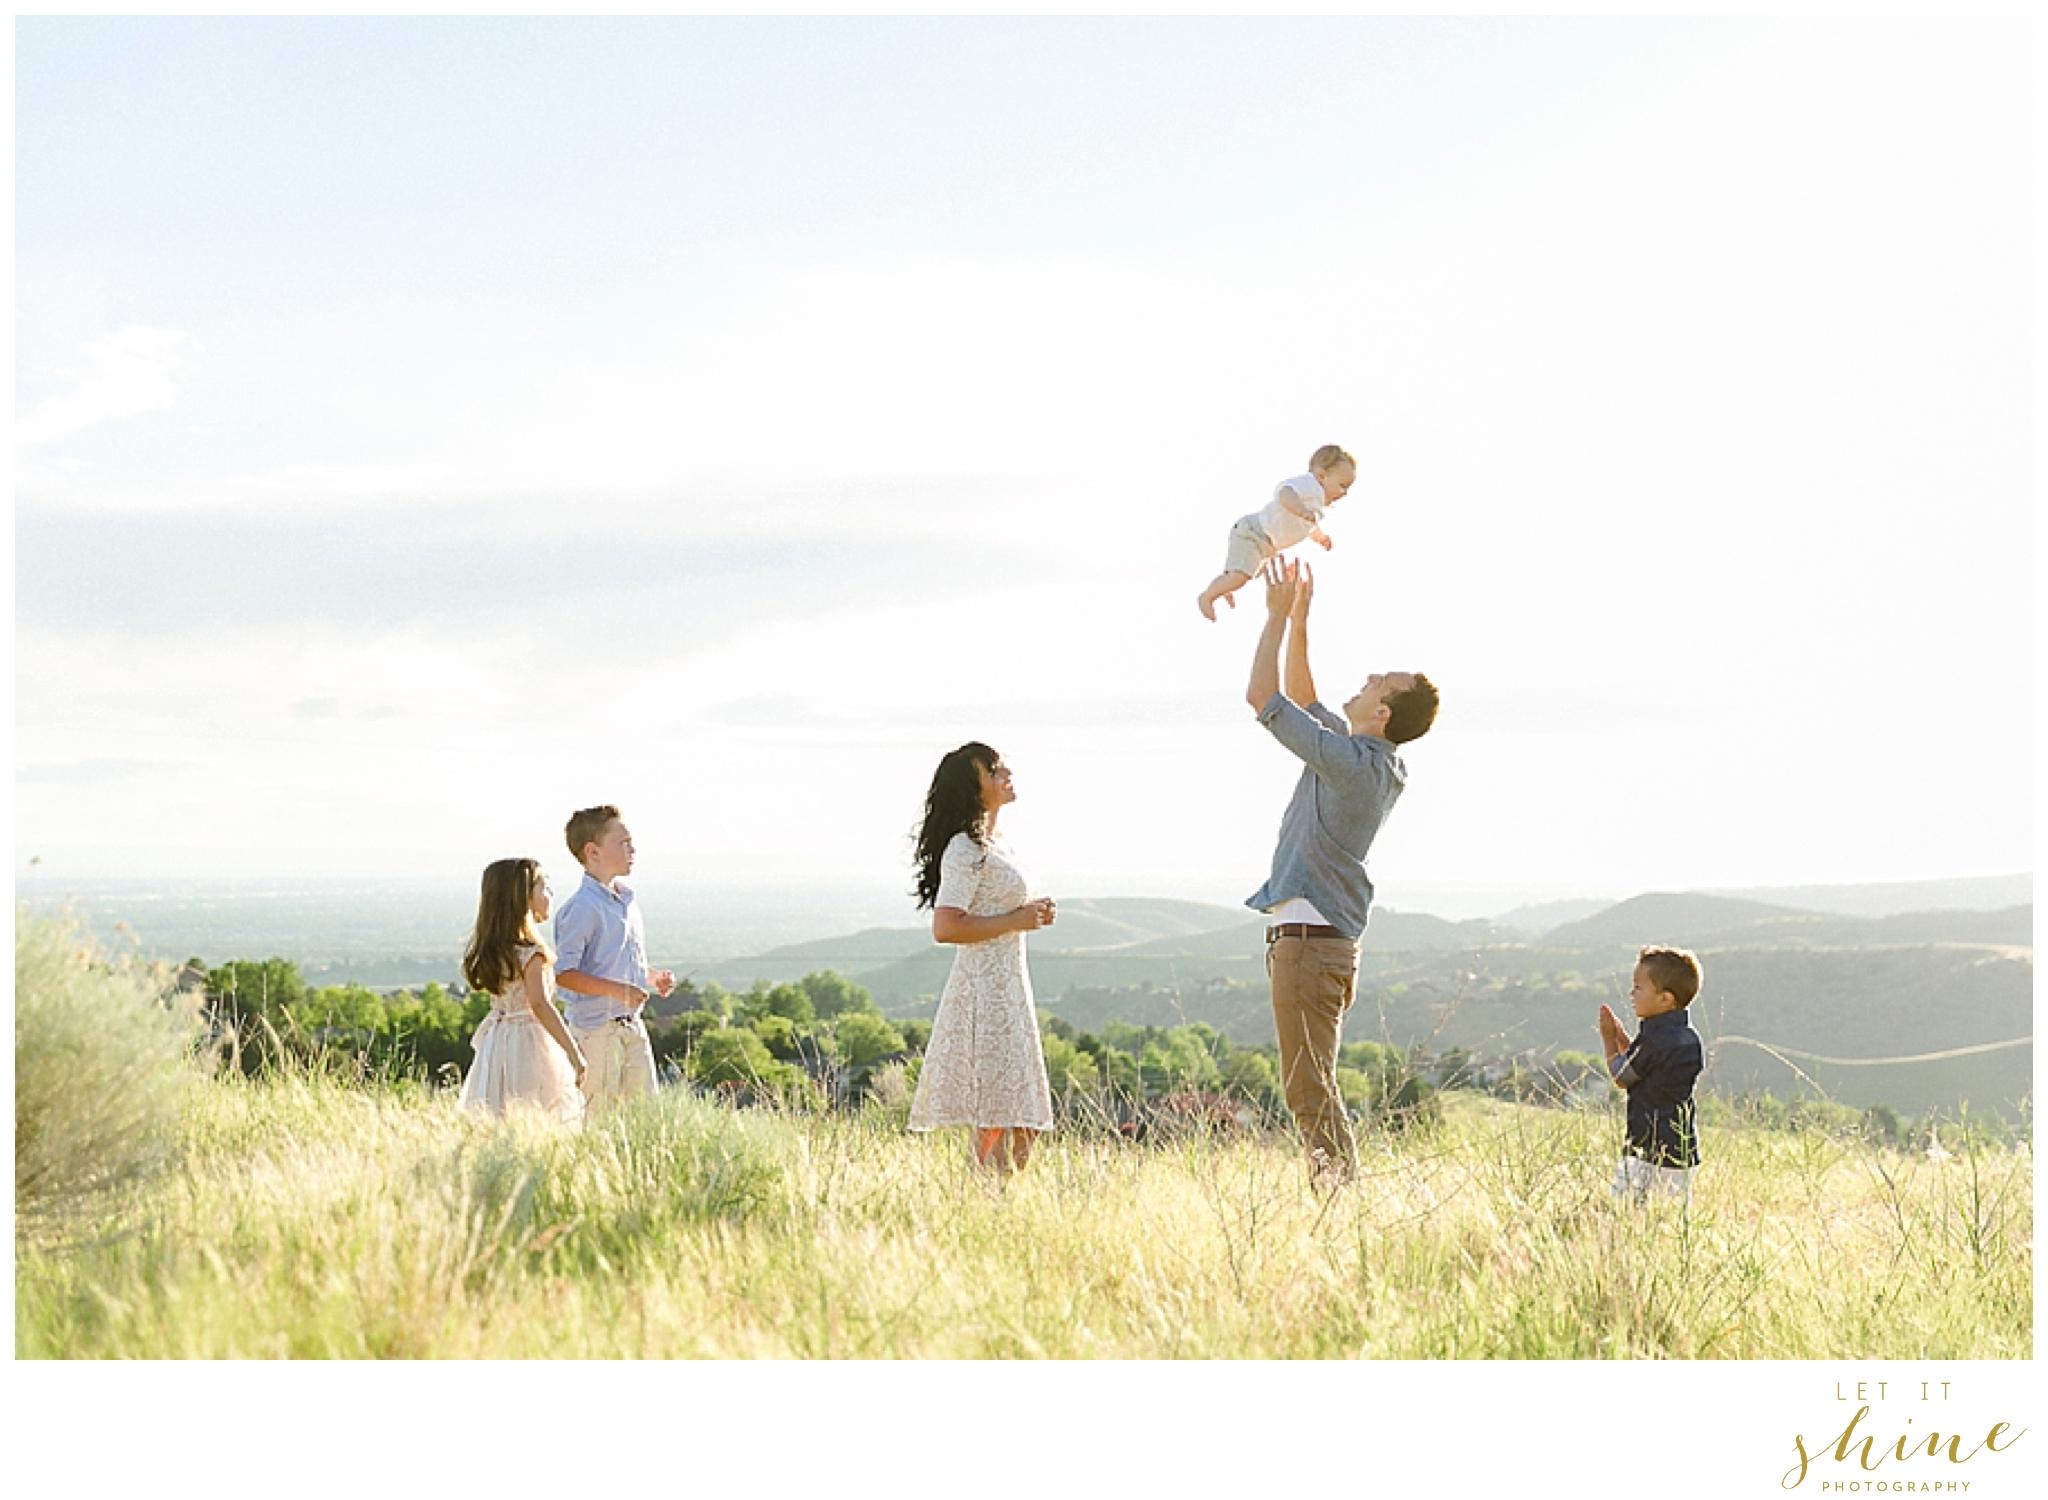 Boise Lifestyle Family Photographer-6551.jpg